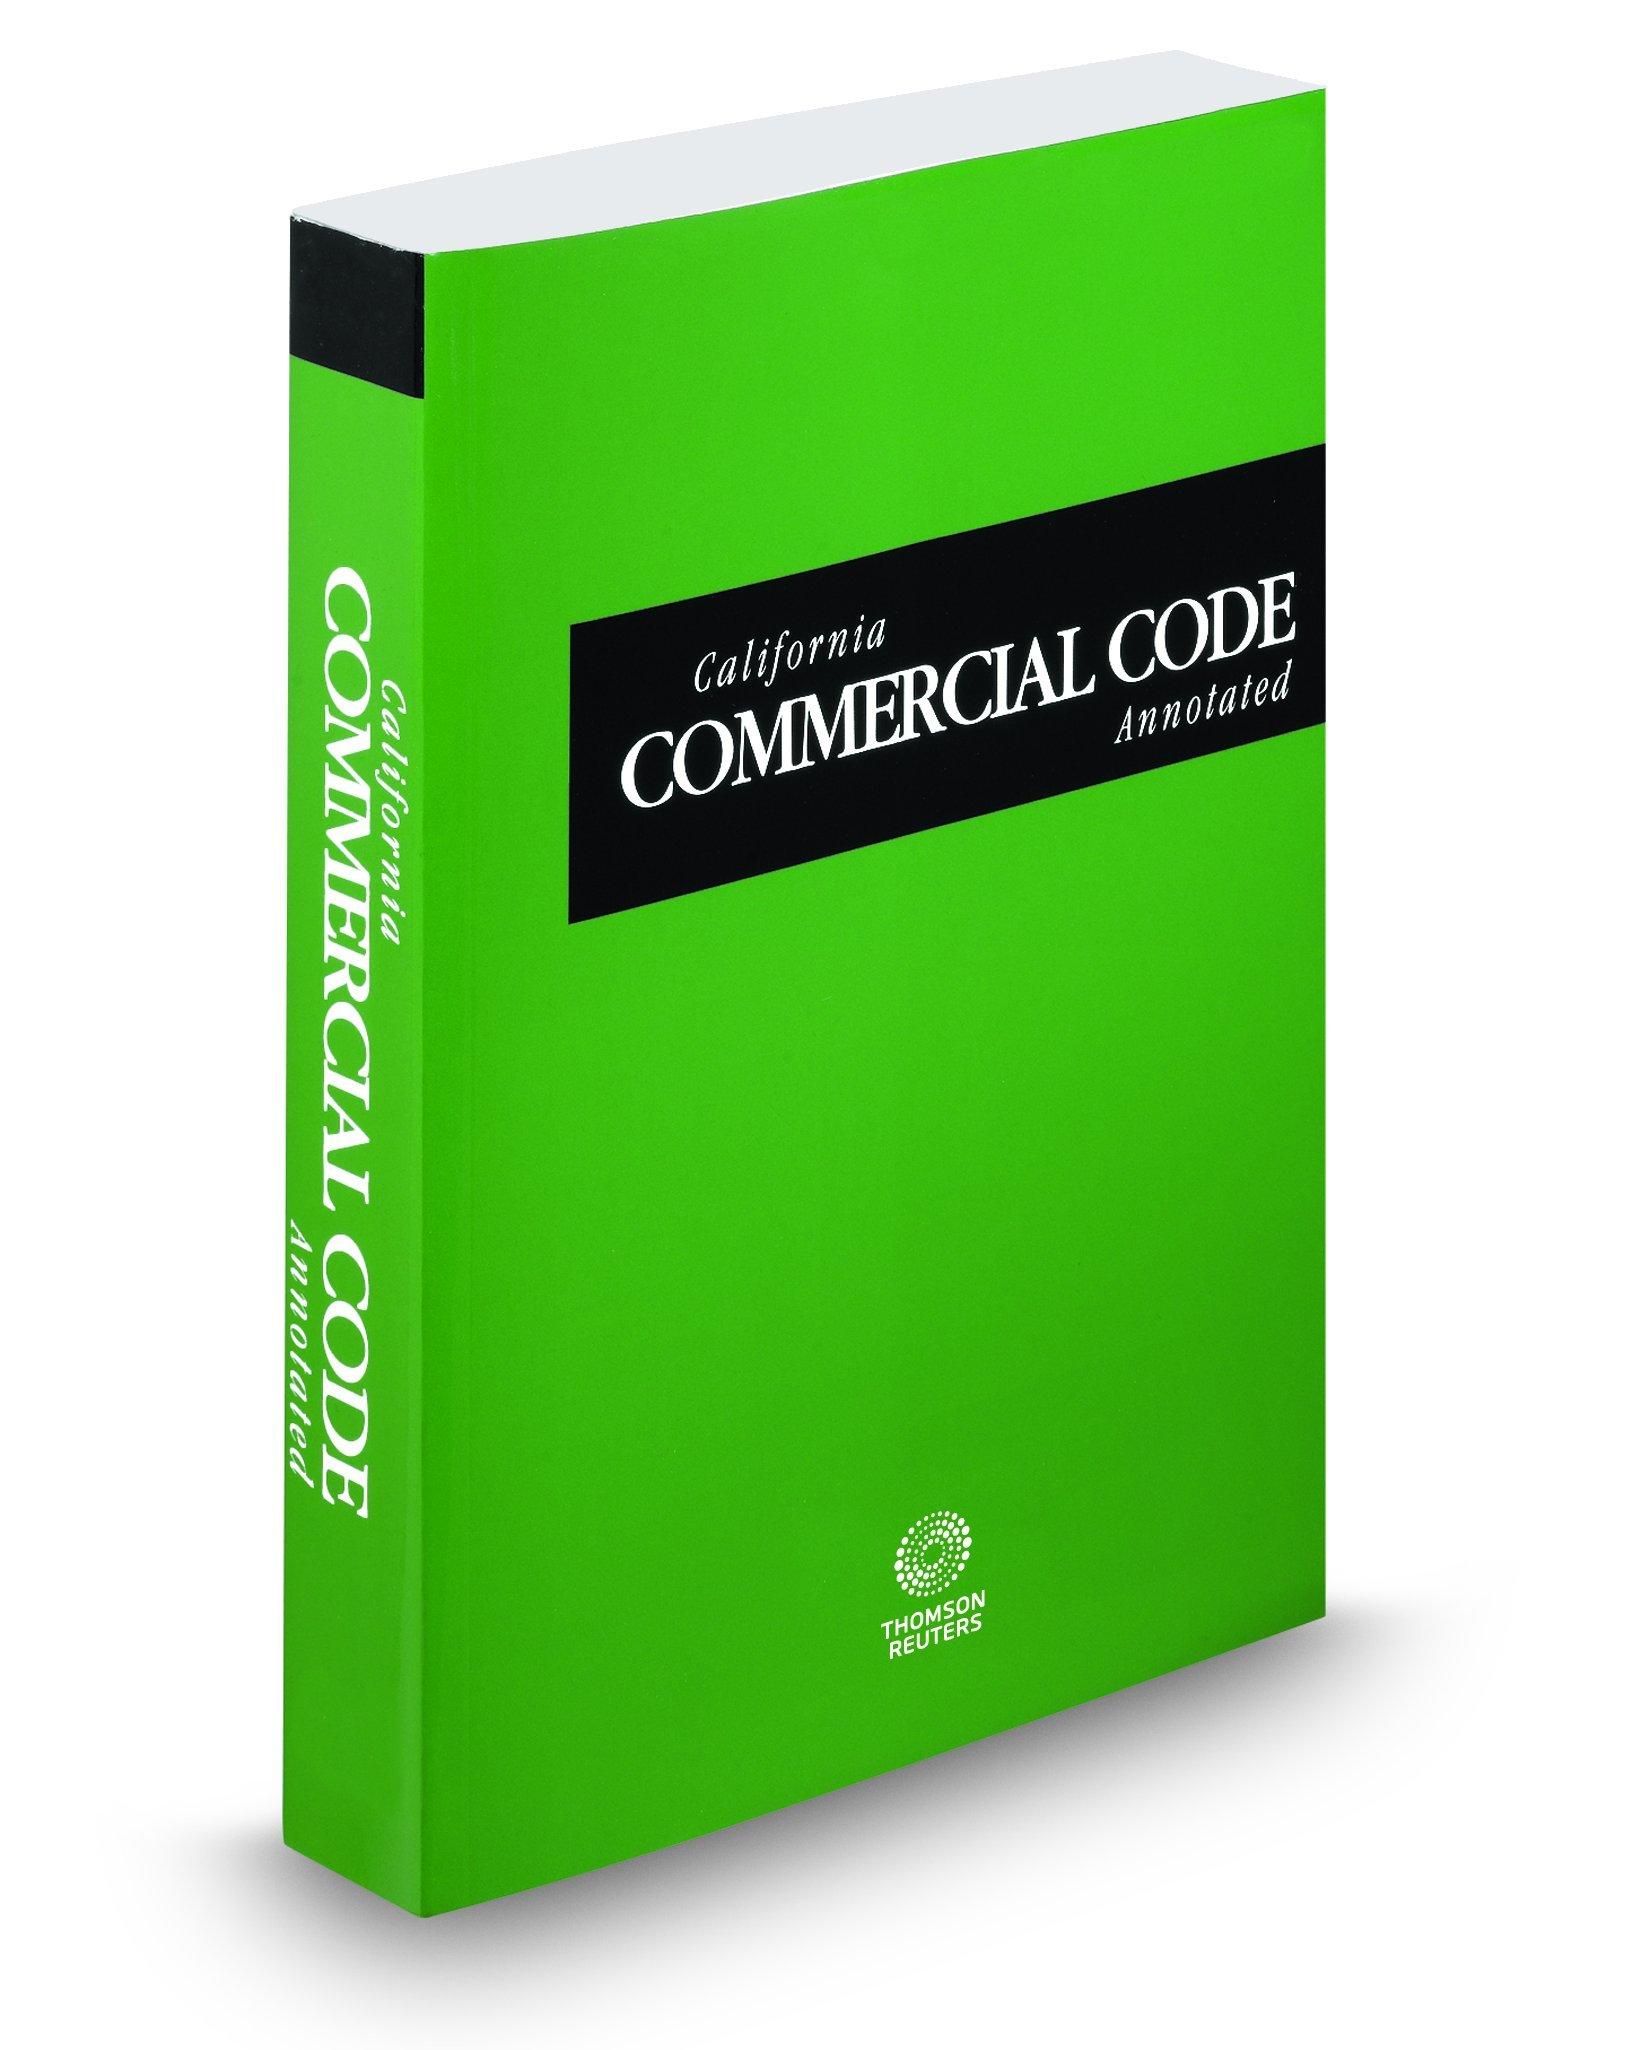 Download California Commercial Code Annotated, 2018 ed. (California Desktop Codes) (American casebook series) ebook